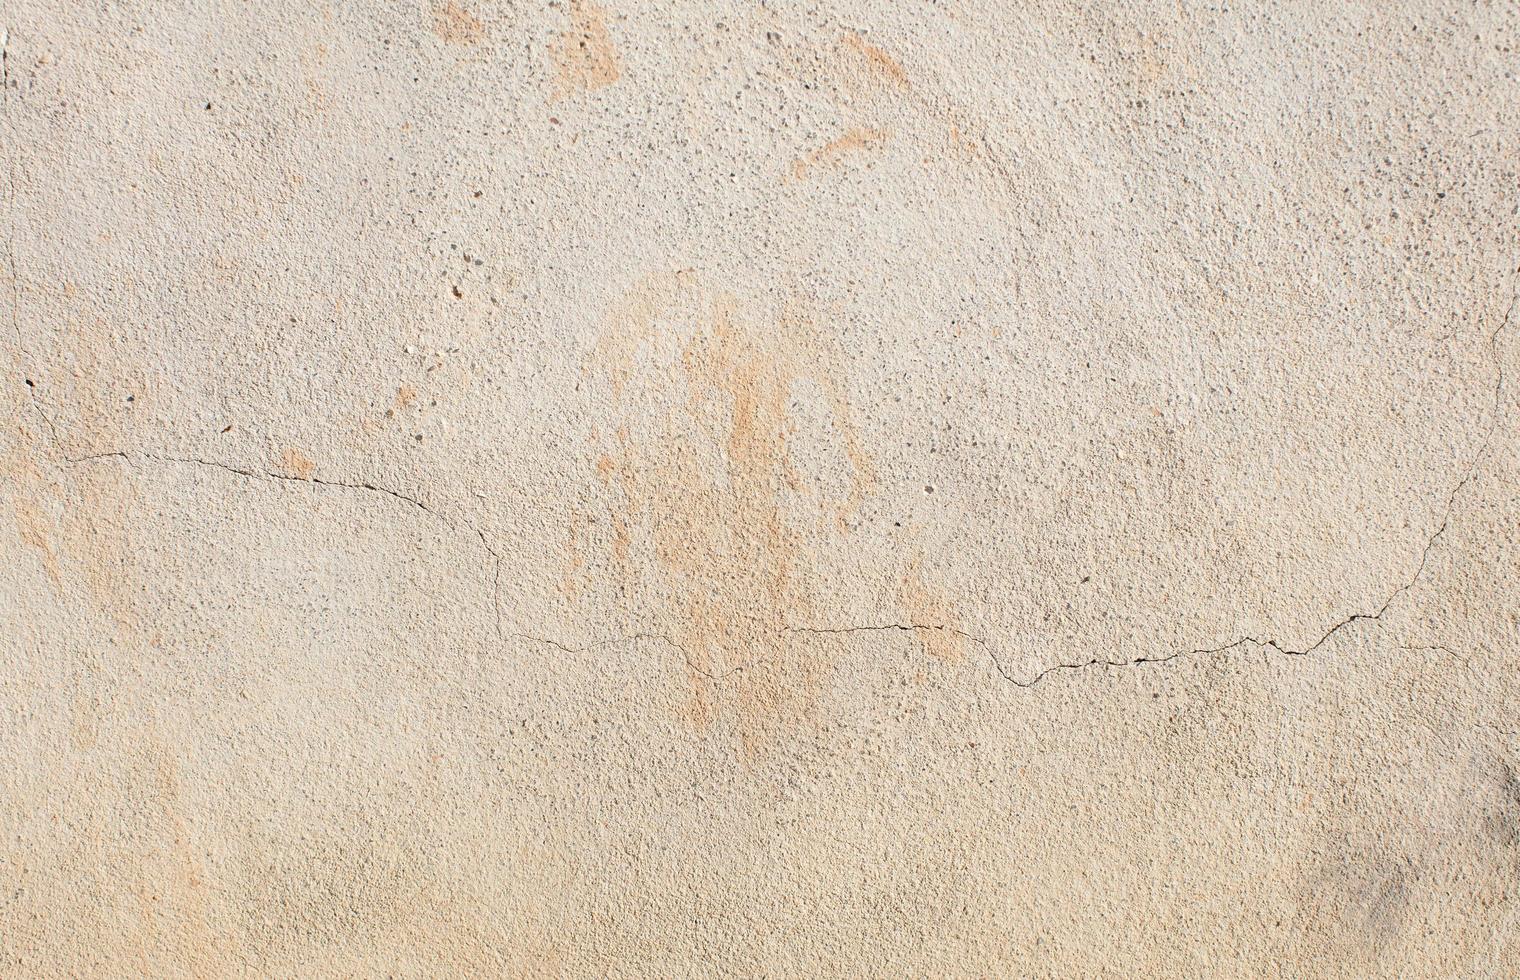 beige Wand Textur foto